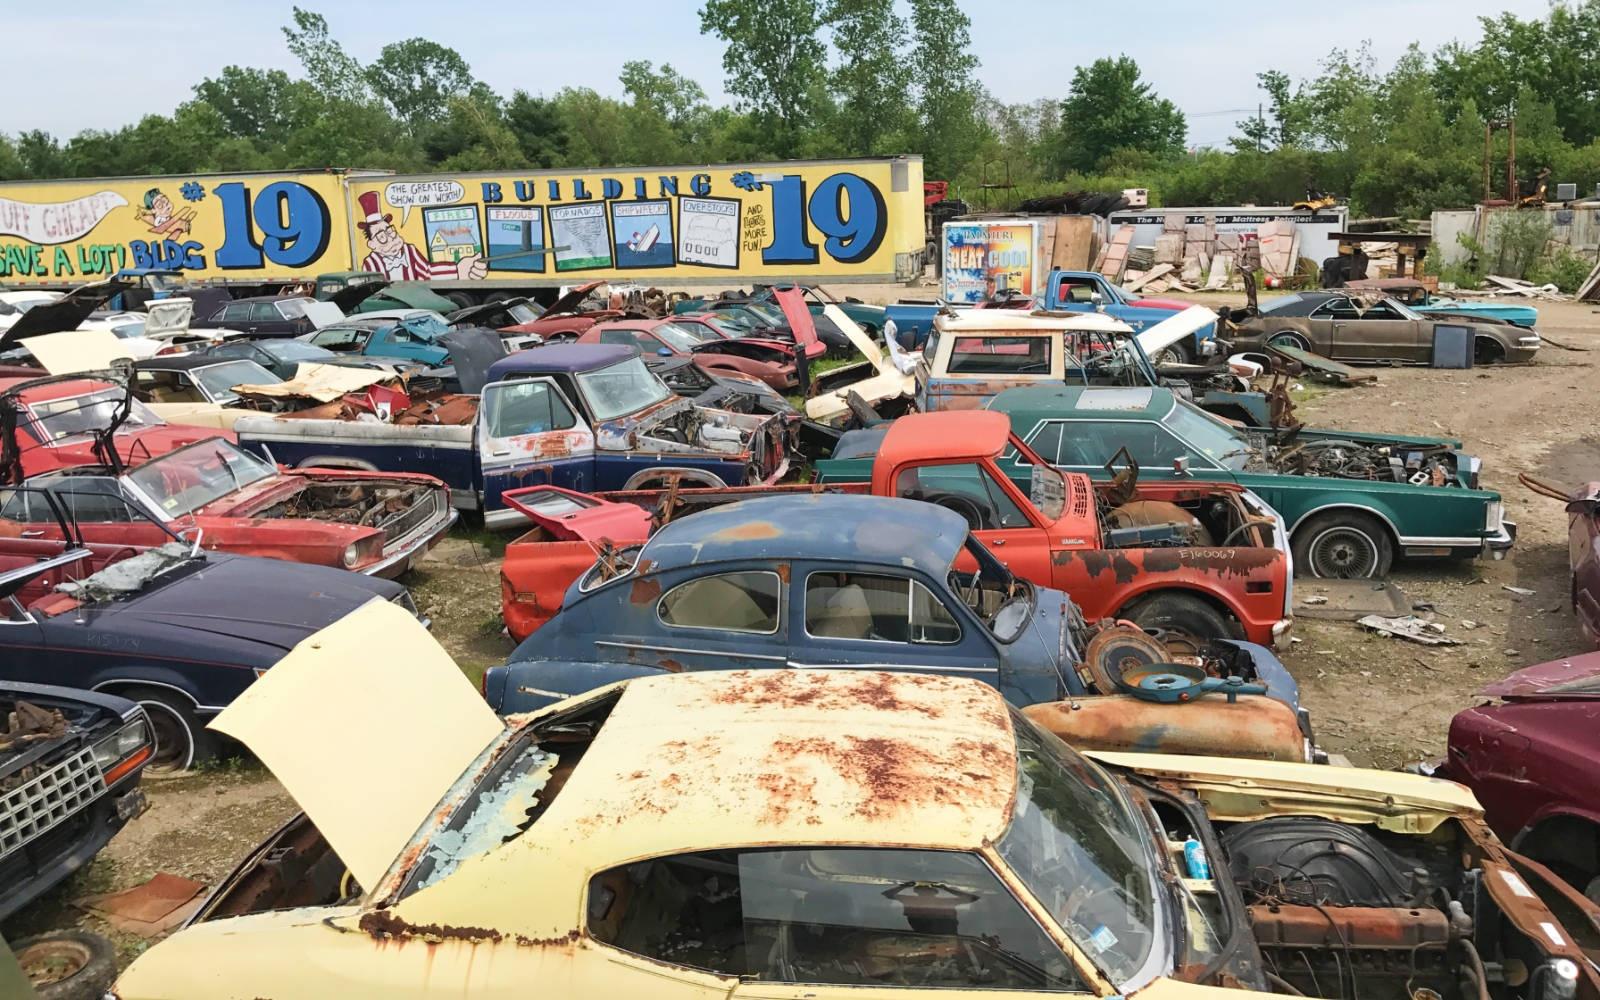 3 old junkyards salvage yards combined junk yard - YouTube |Salvage Yard